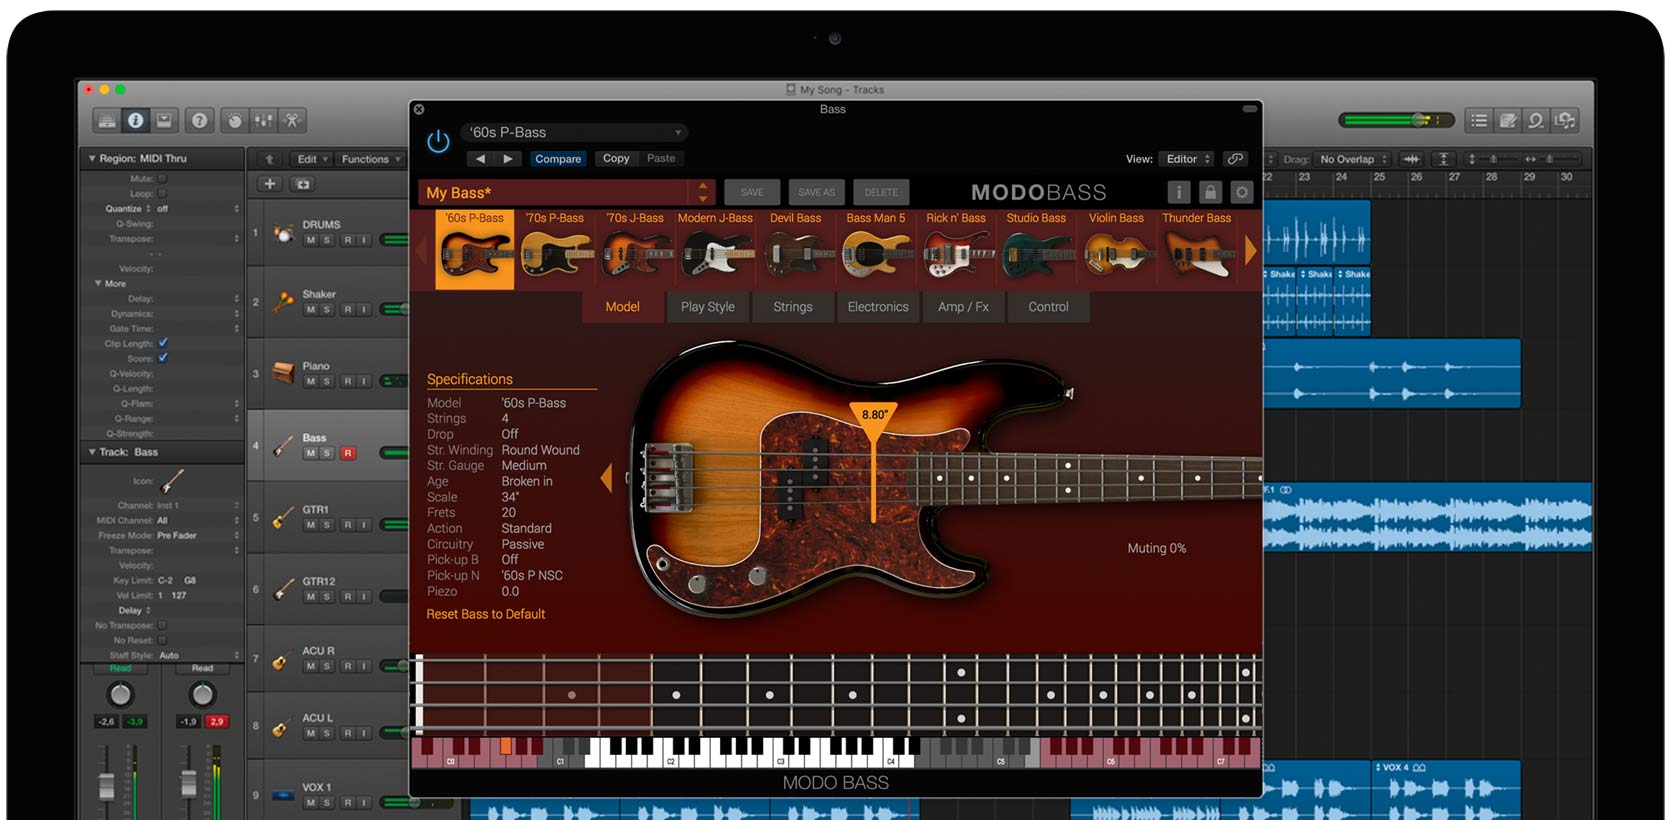 IK Multimedia MODO BASS 1.5.2 Mac 破解版 第一款物理建模贝斯的虚拟乐器